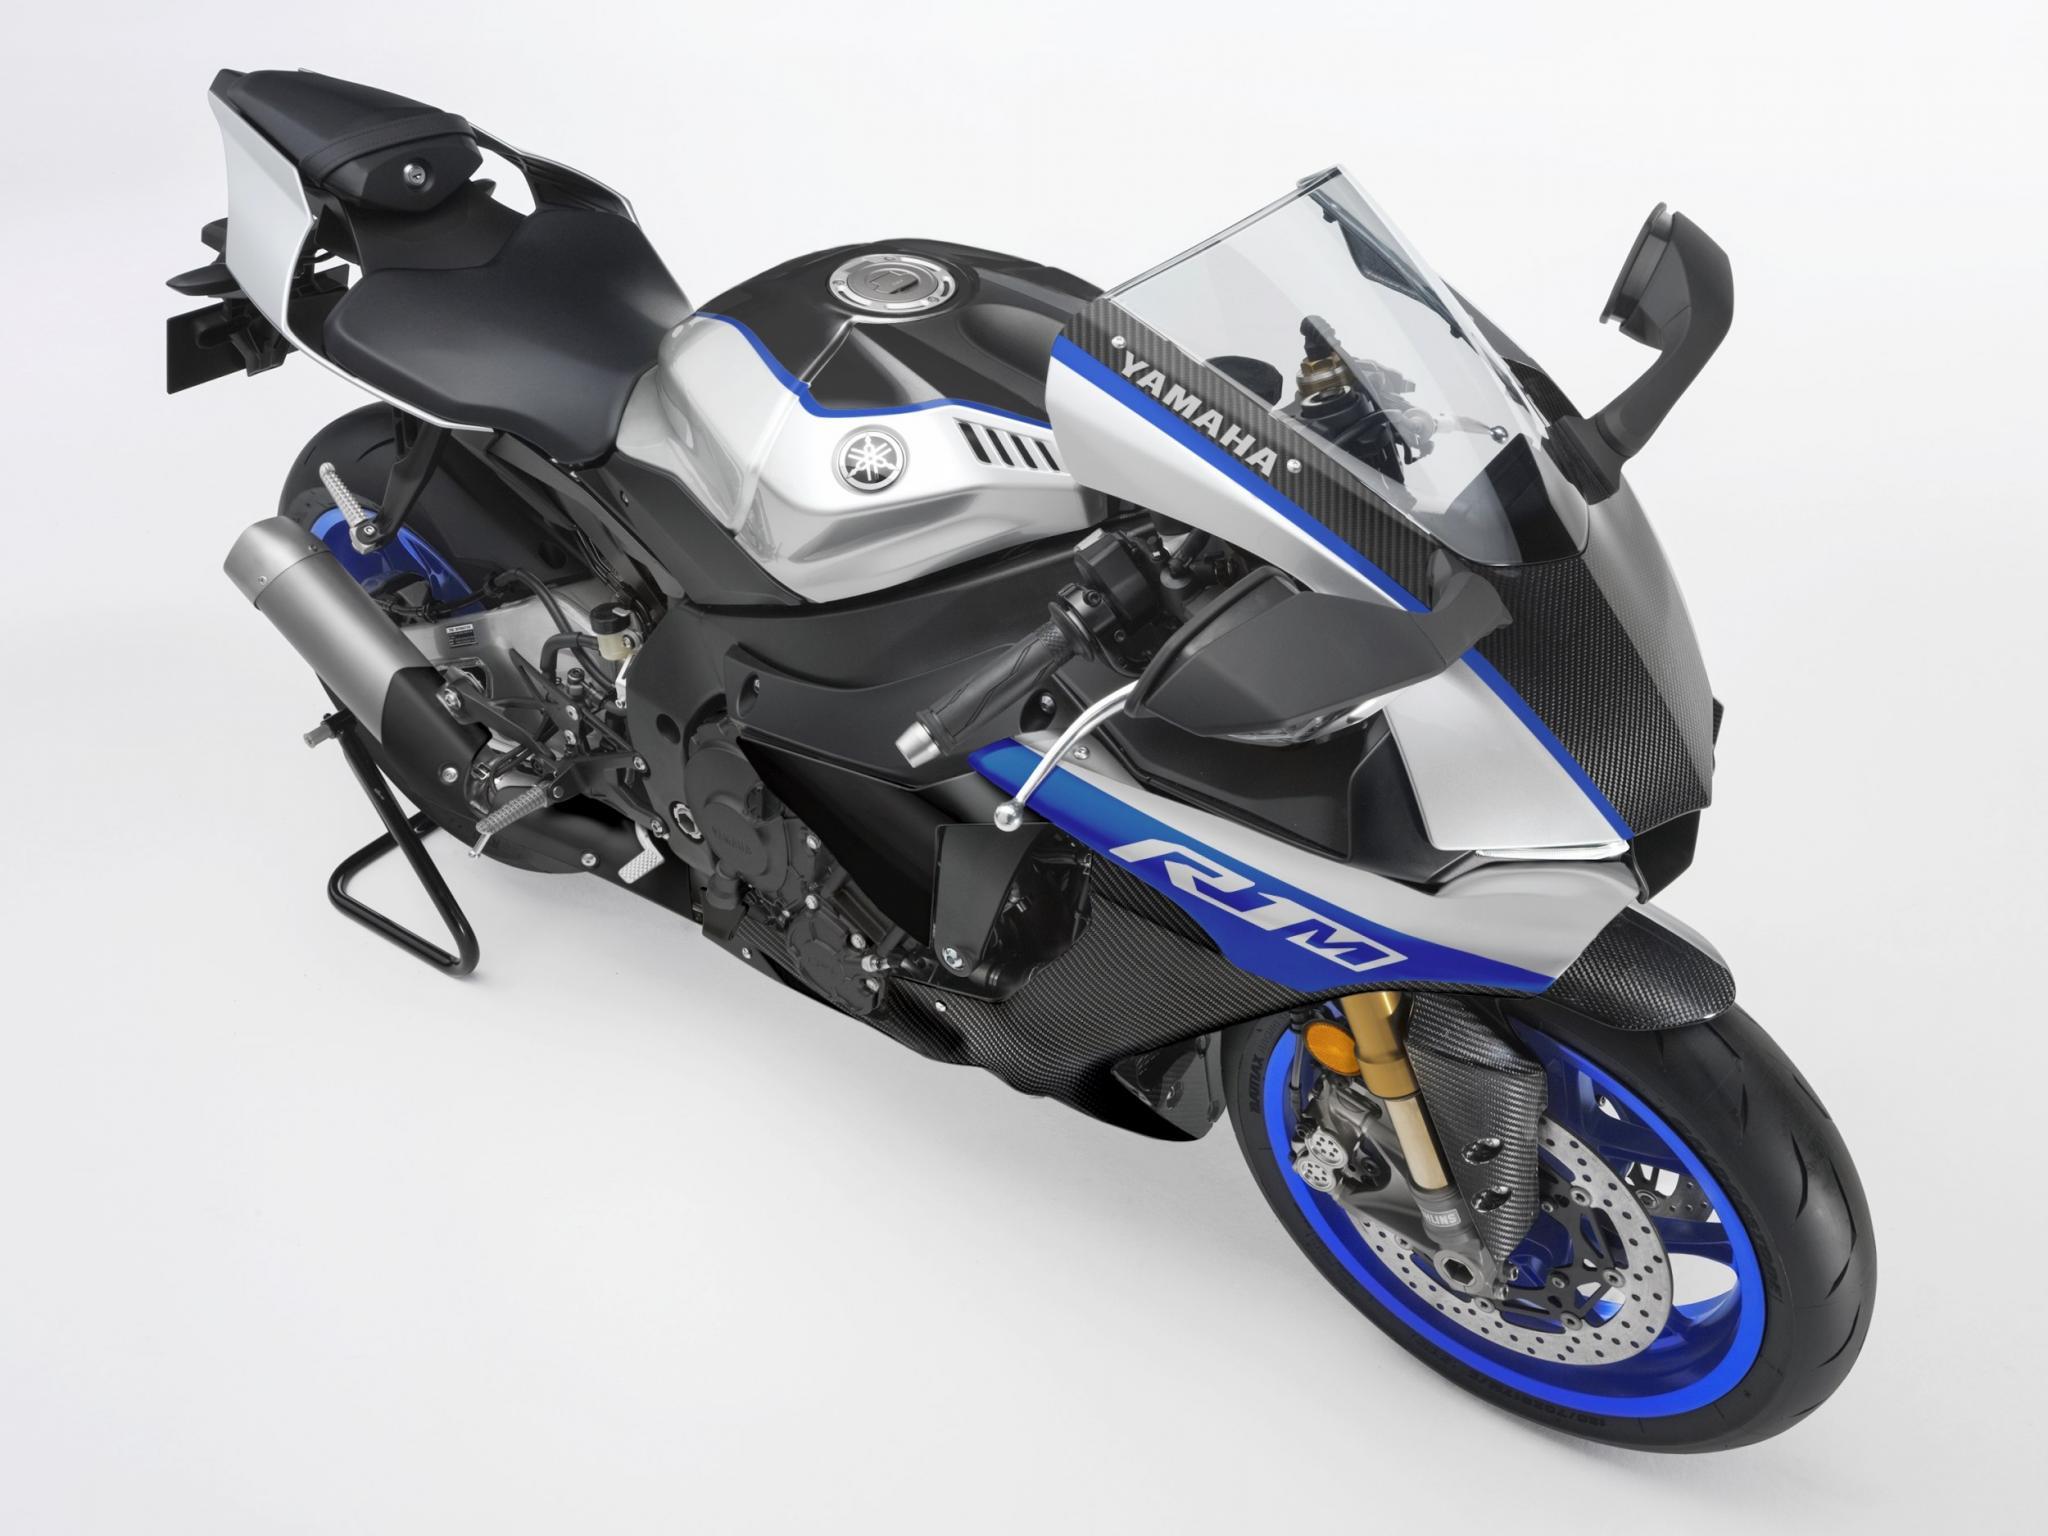 Yamaha Neuheiten 2018: Yamaha R1 und R1M 2018 - Modellnews